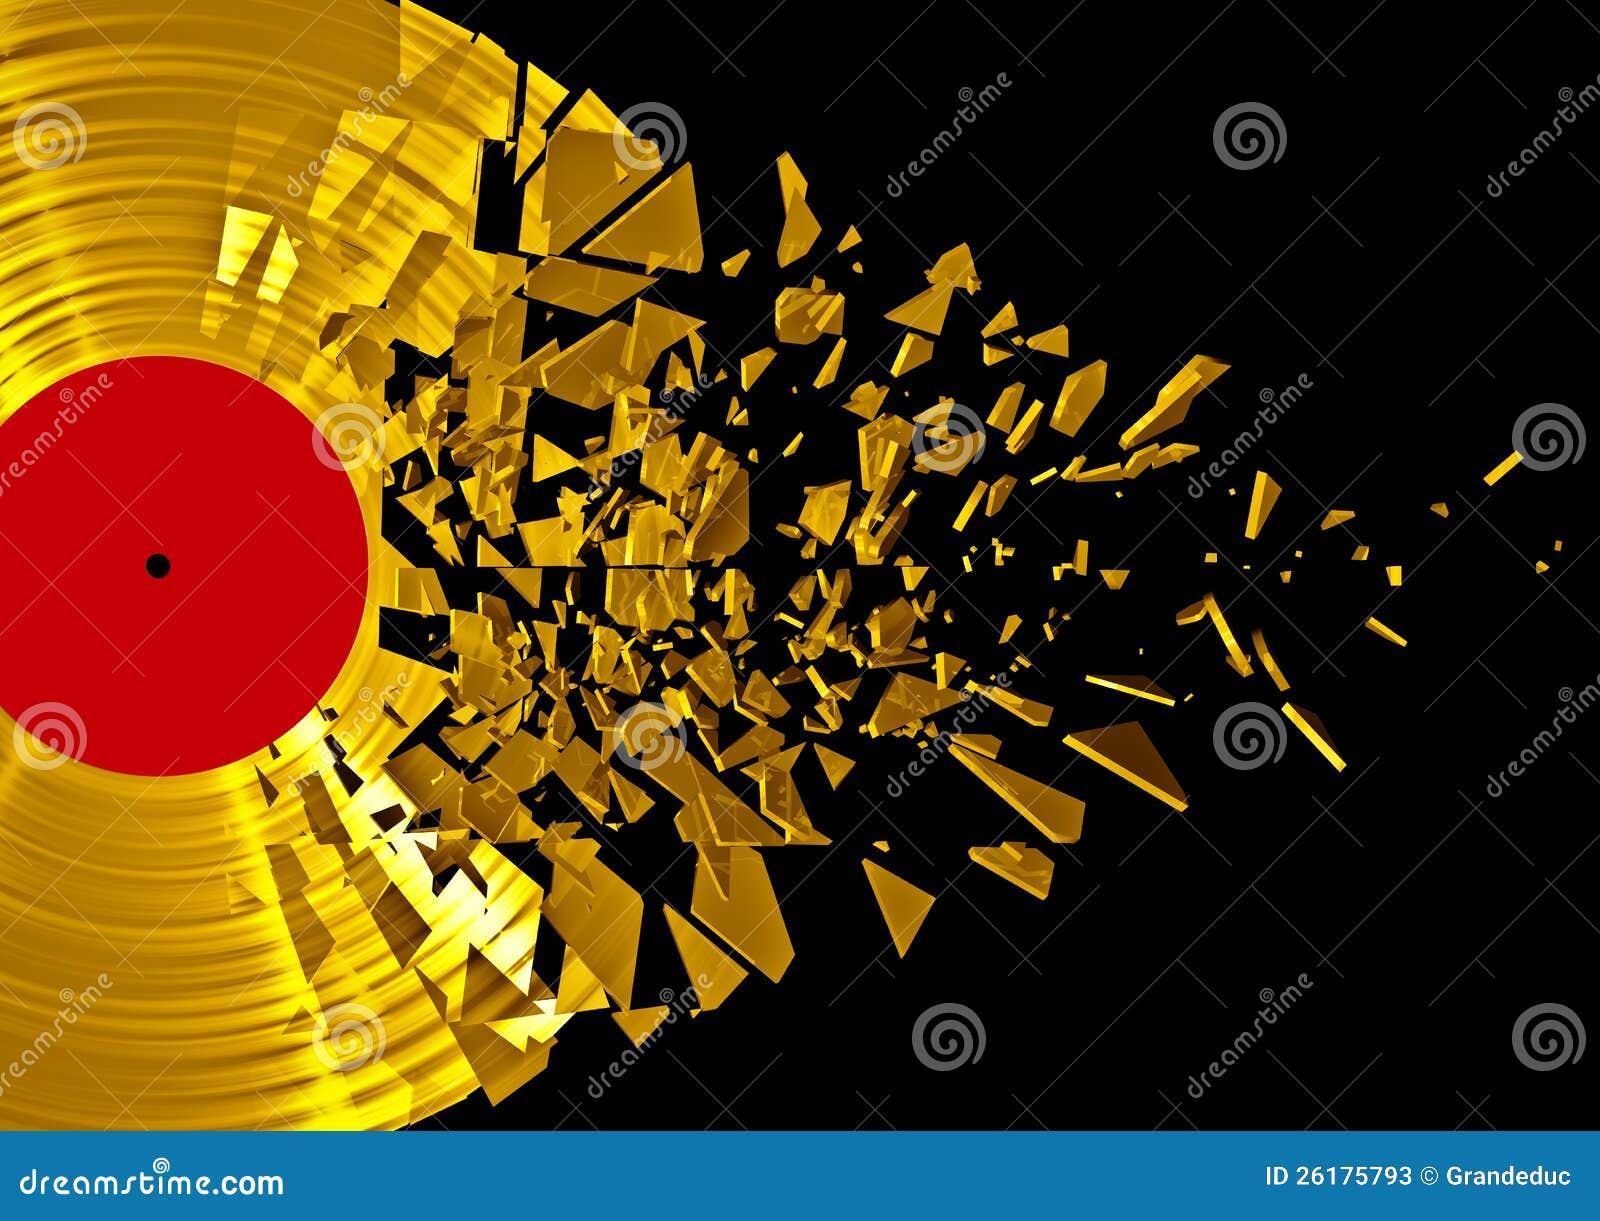 Vinyl Shatter Gold Stock Photos Image 26175793